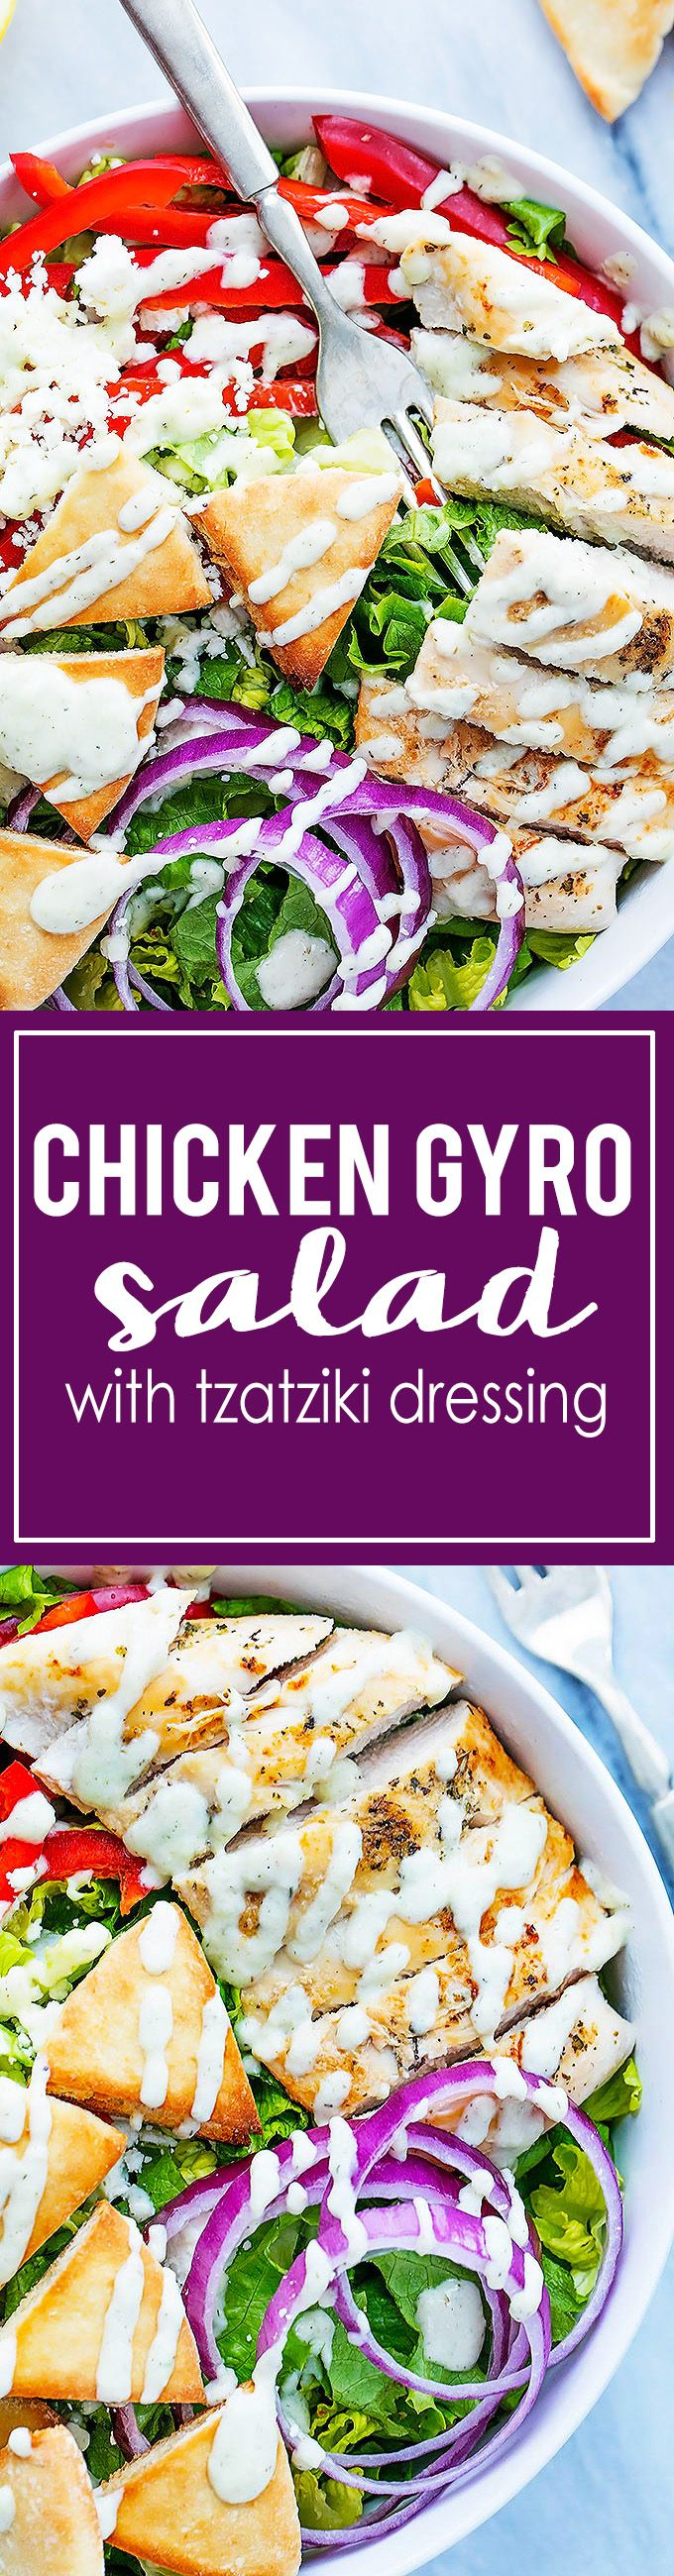 Chicken Gyro Salad with Tzatziki Dressing | Creme de la Crumb